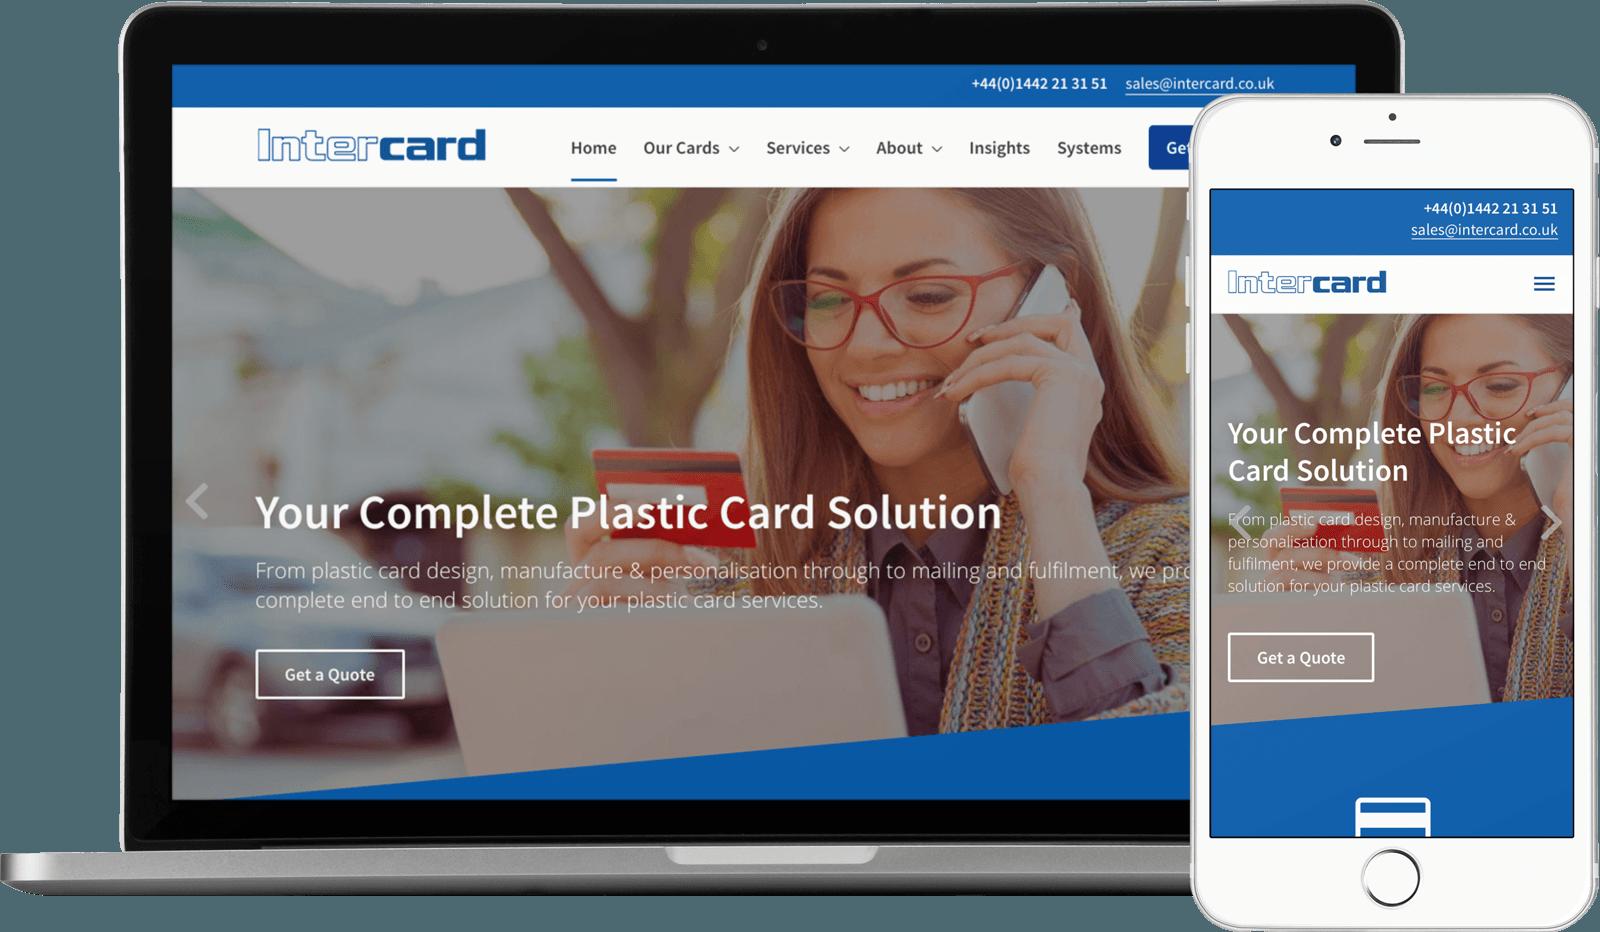 Macbook / iPhone view of the Intercard website